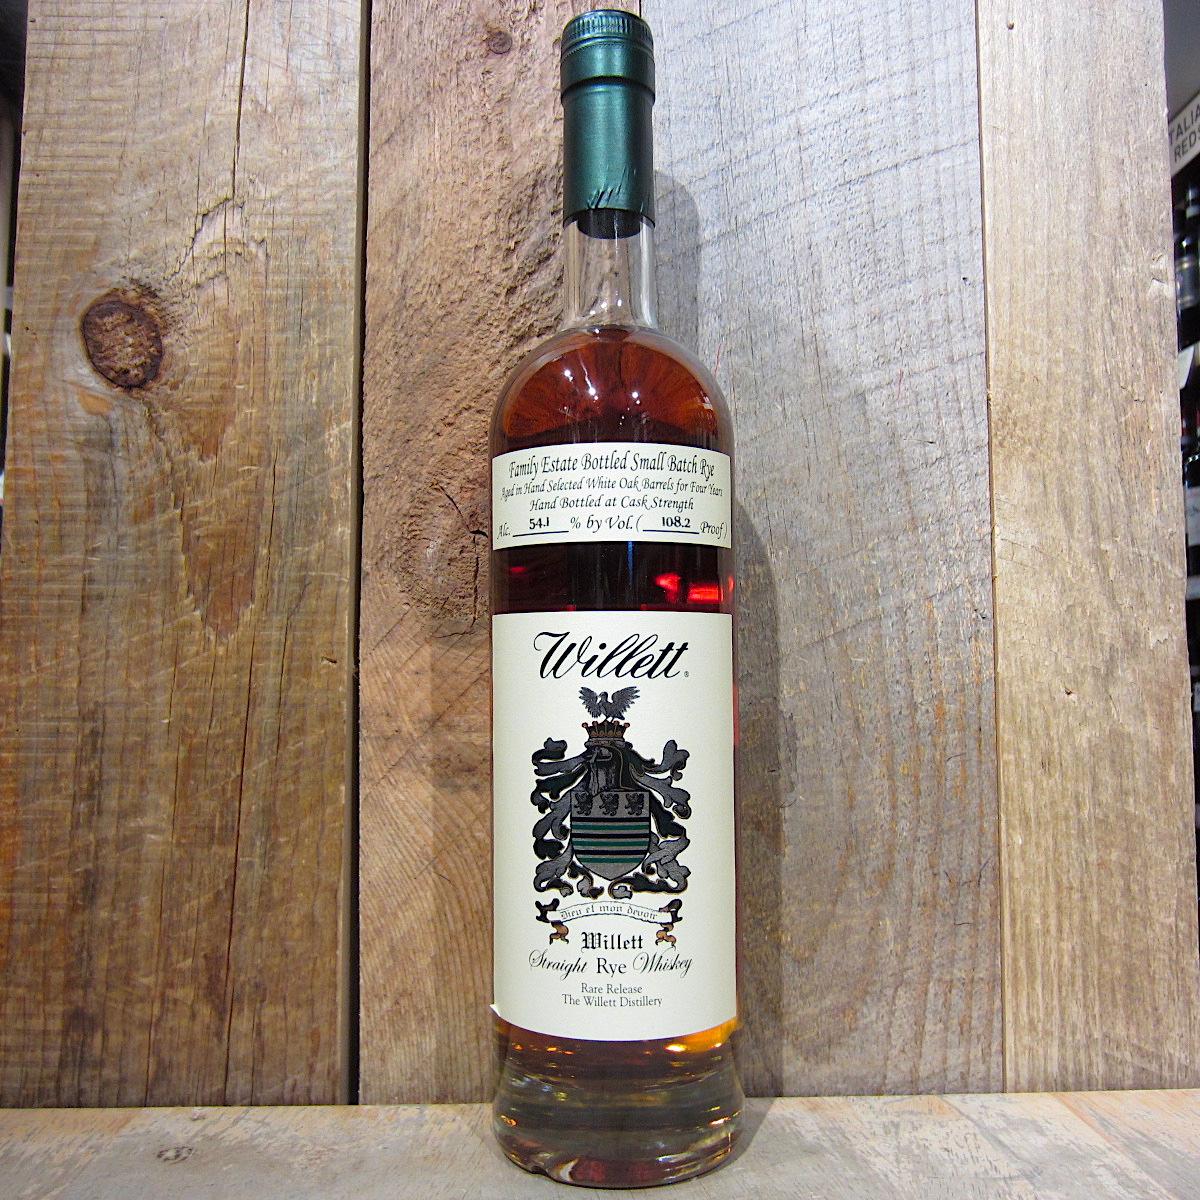 Willett 4yr Straight Rye Whiskey 108.2 Proof 750ml